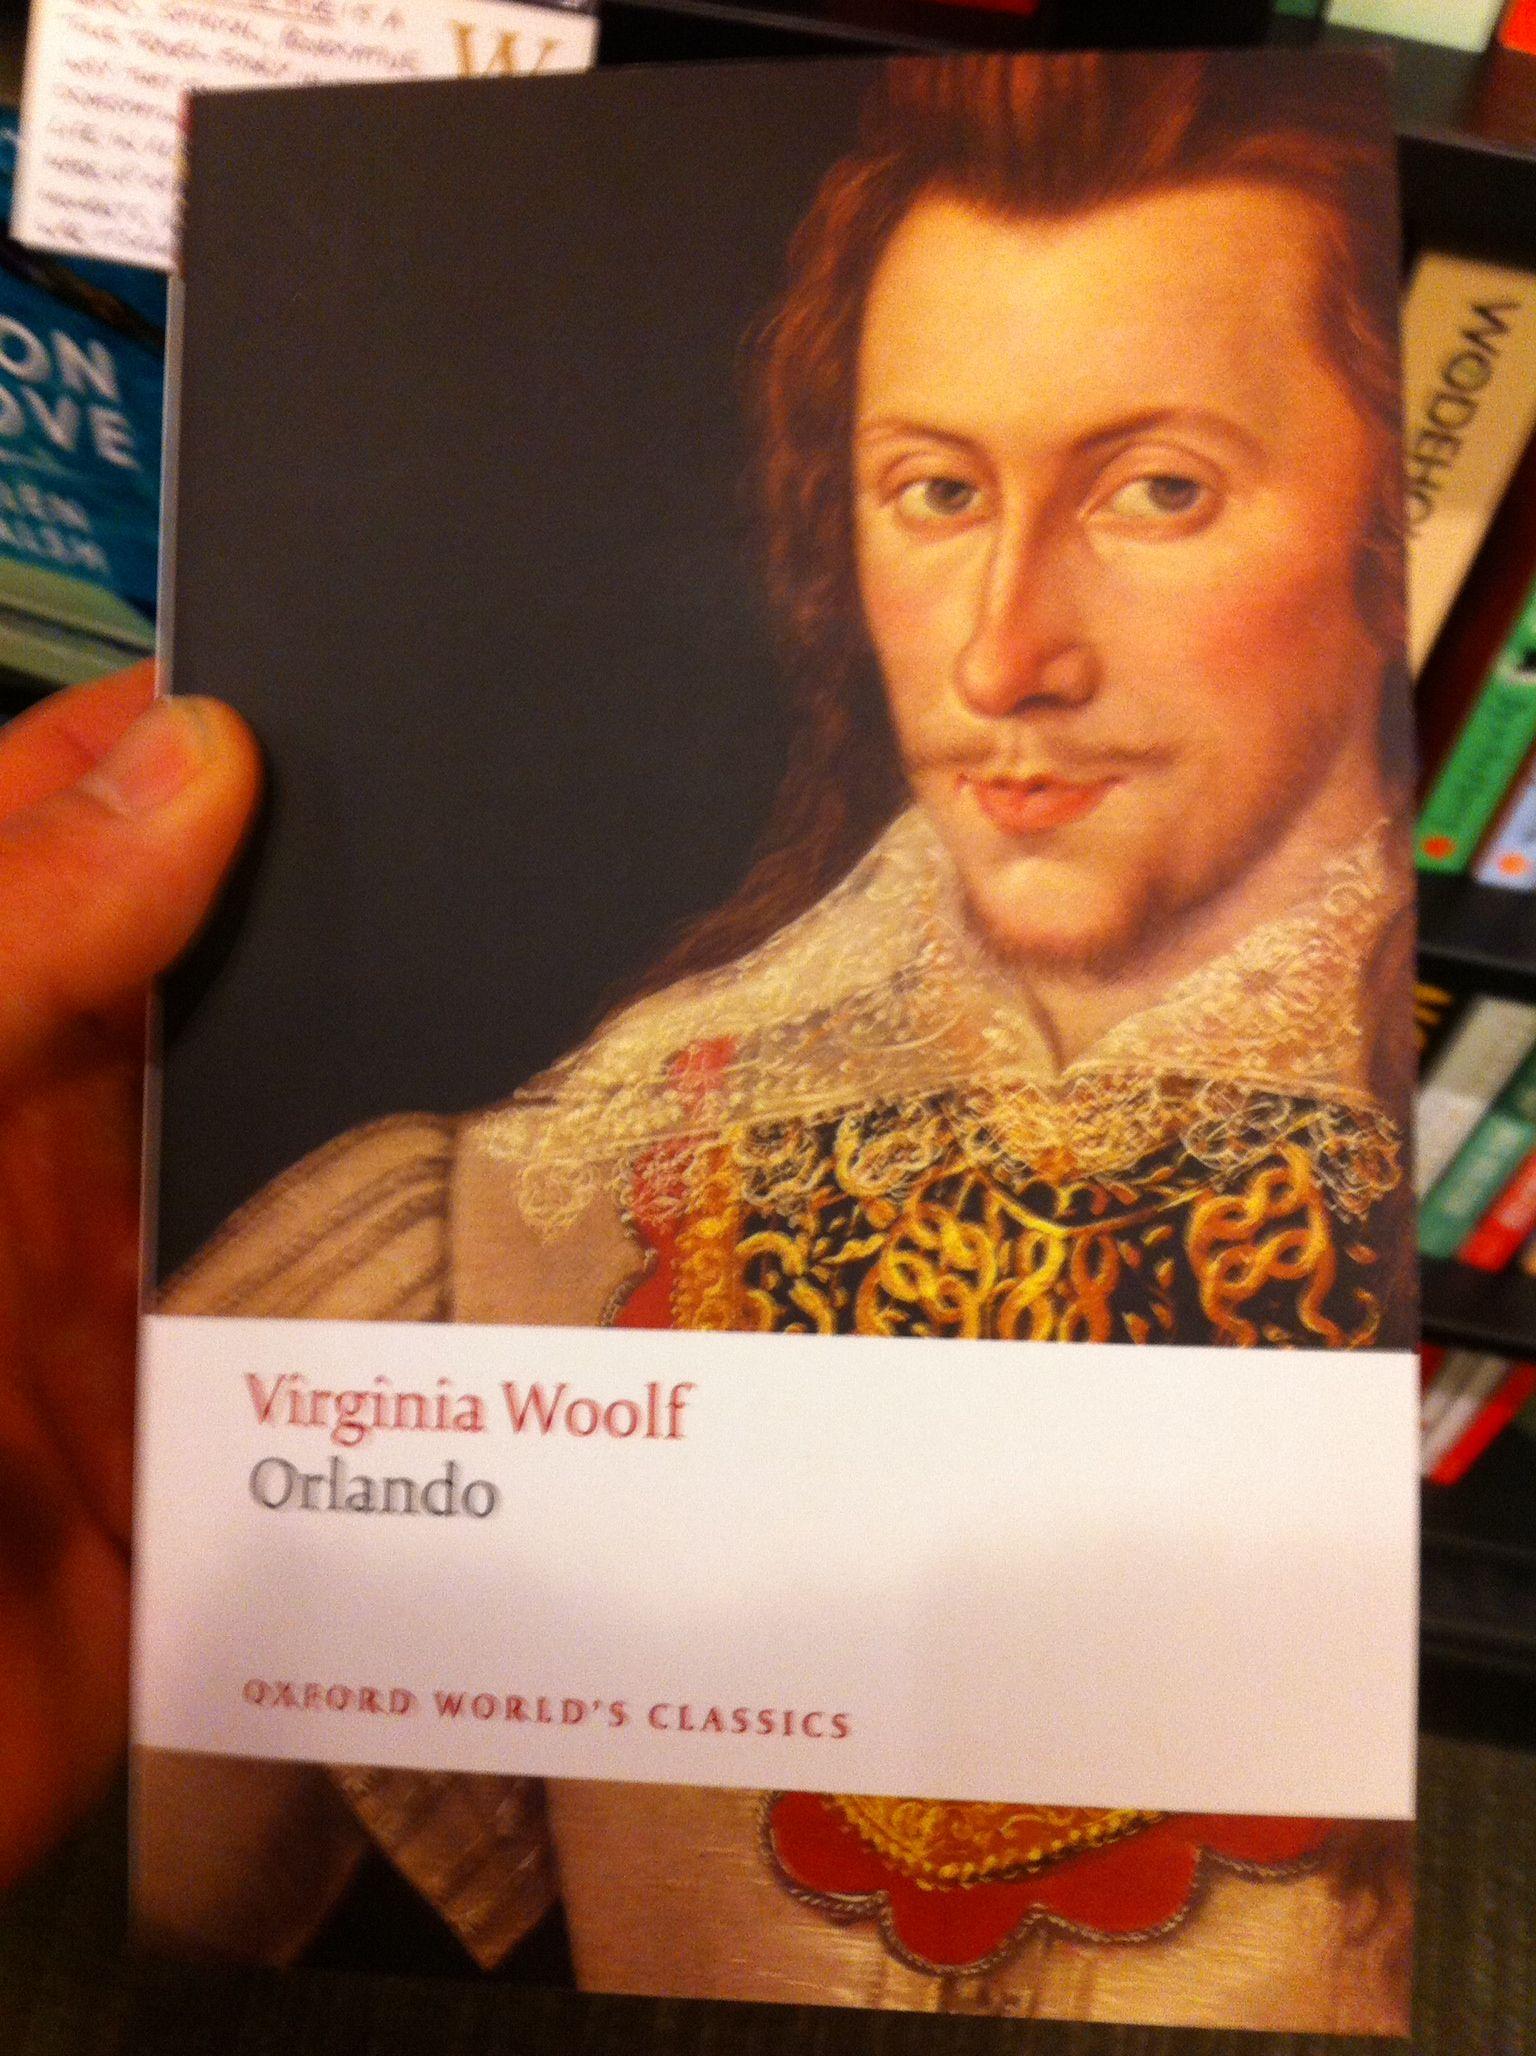 Pin by Richard Hodgson on Books 2015 Virginia woolf